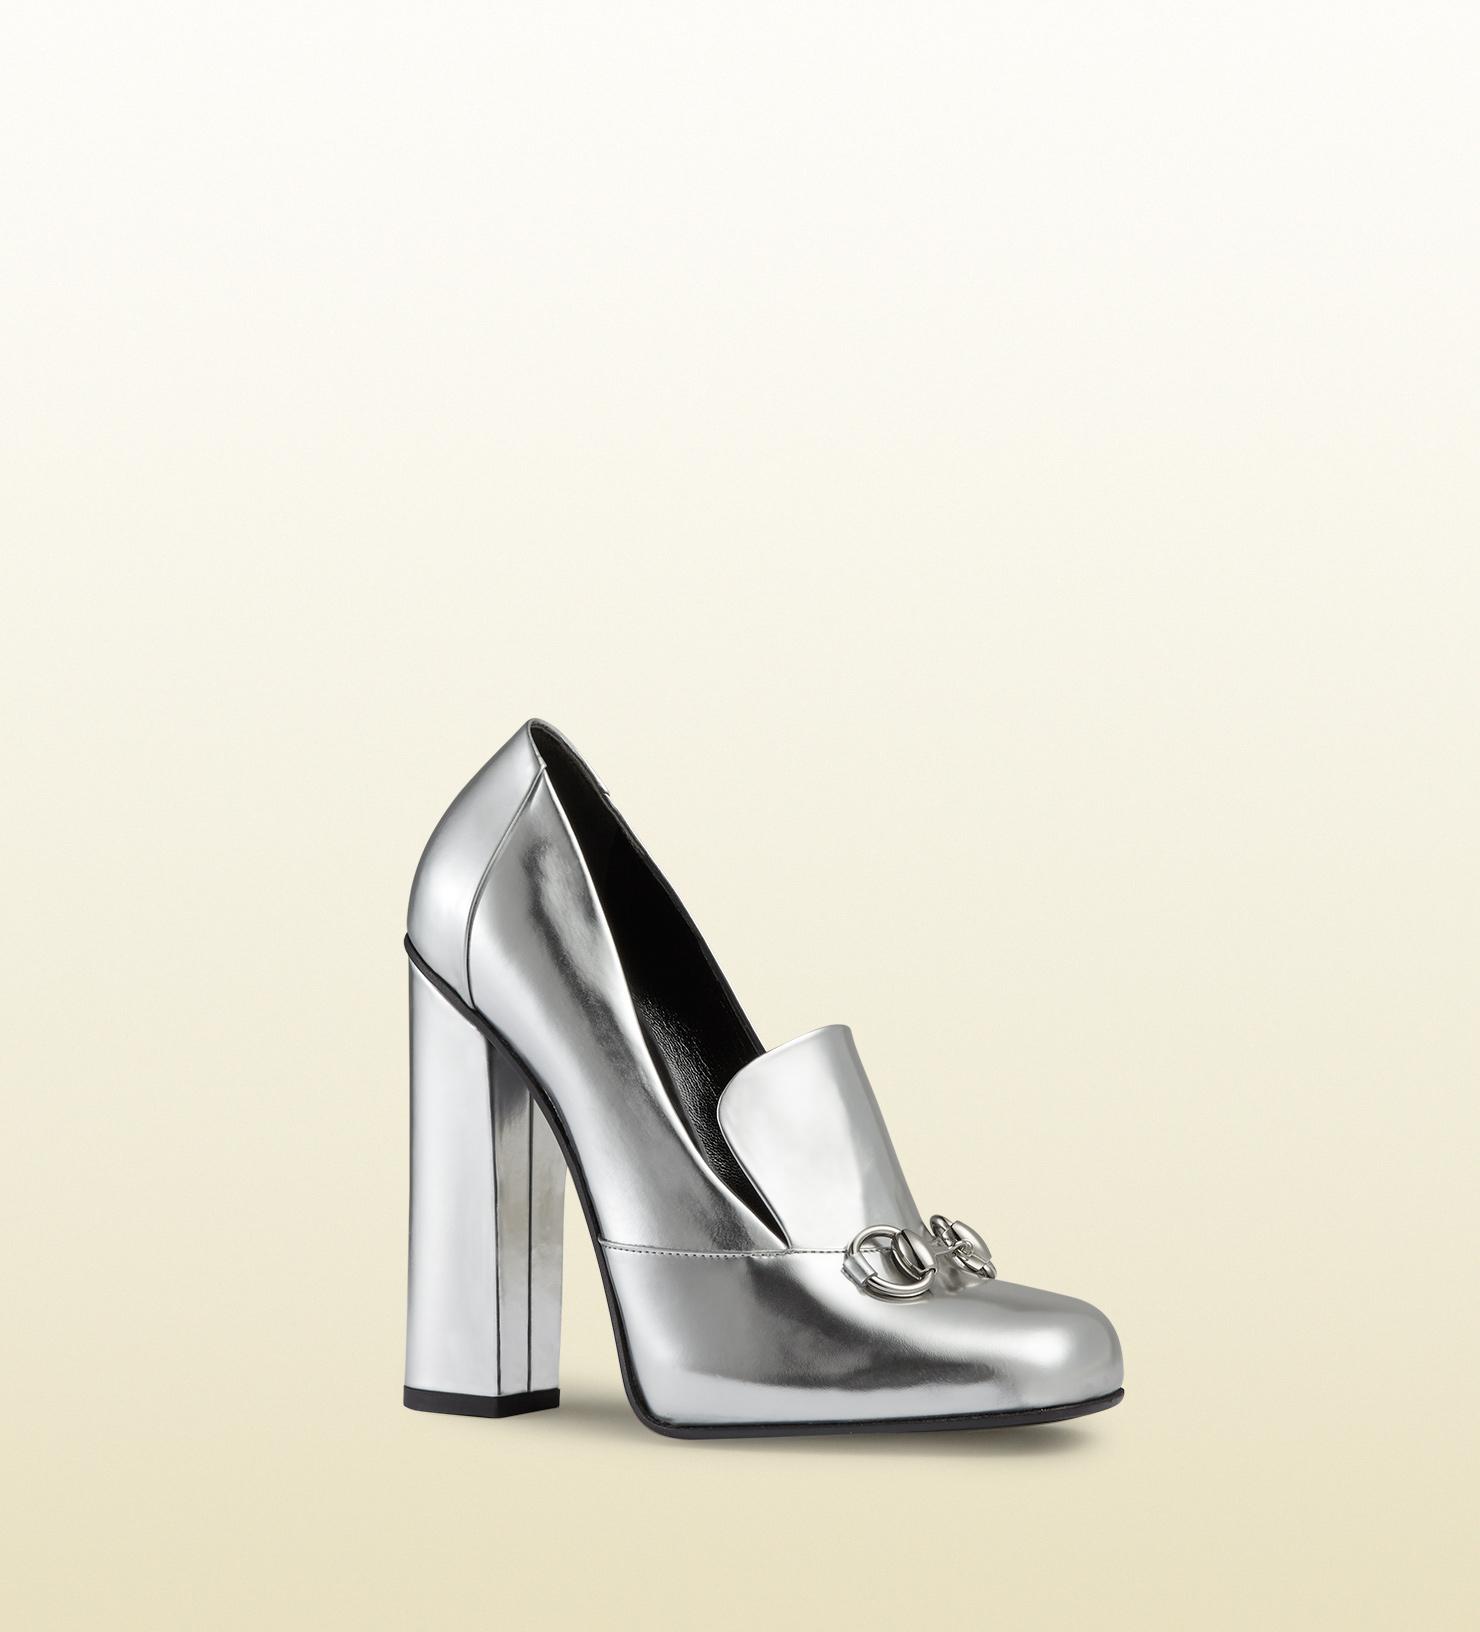 Metallic leather loafer pumps Gucci 3yeJXG